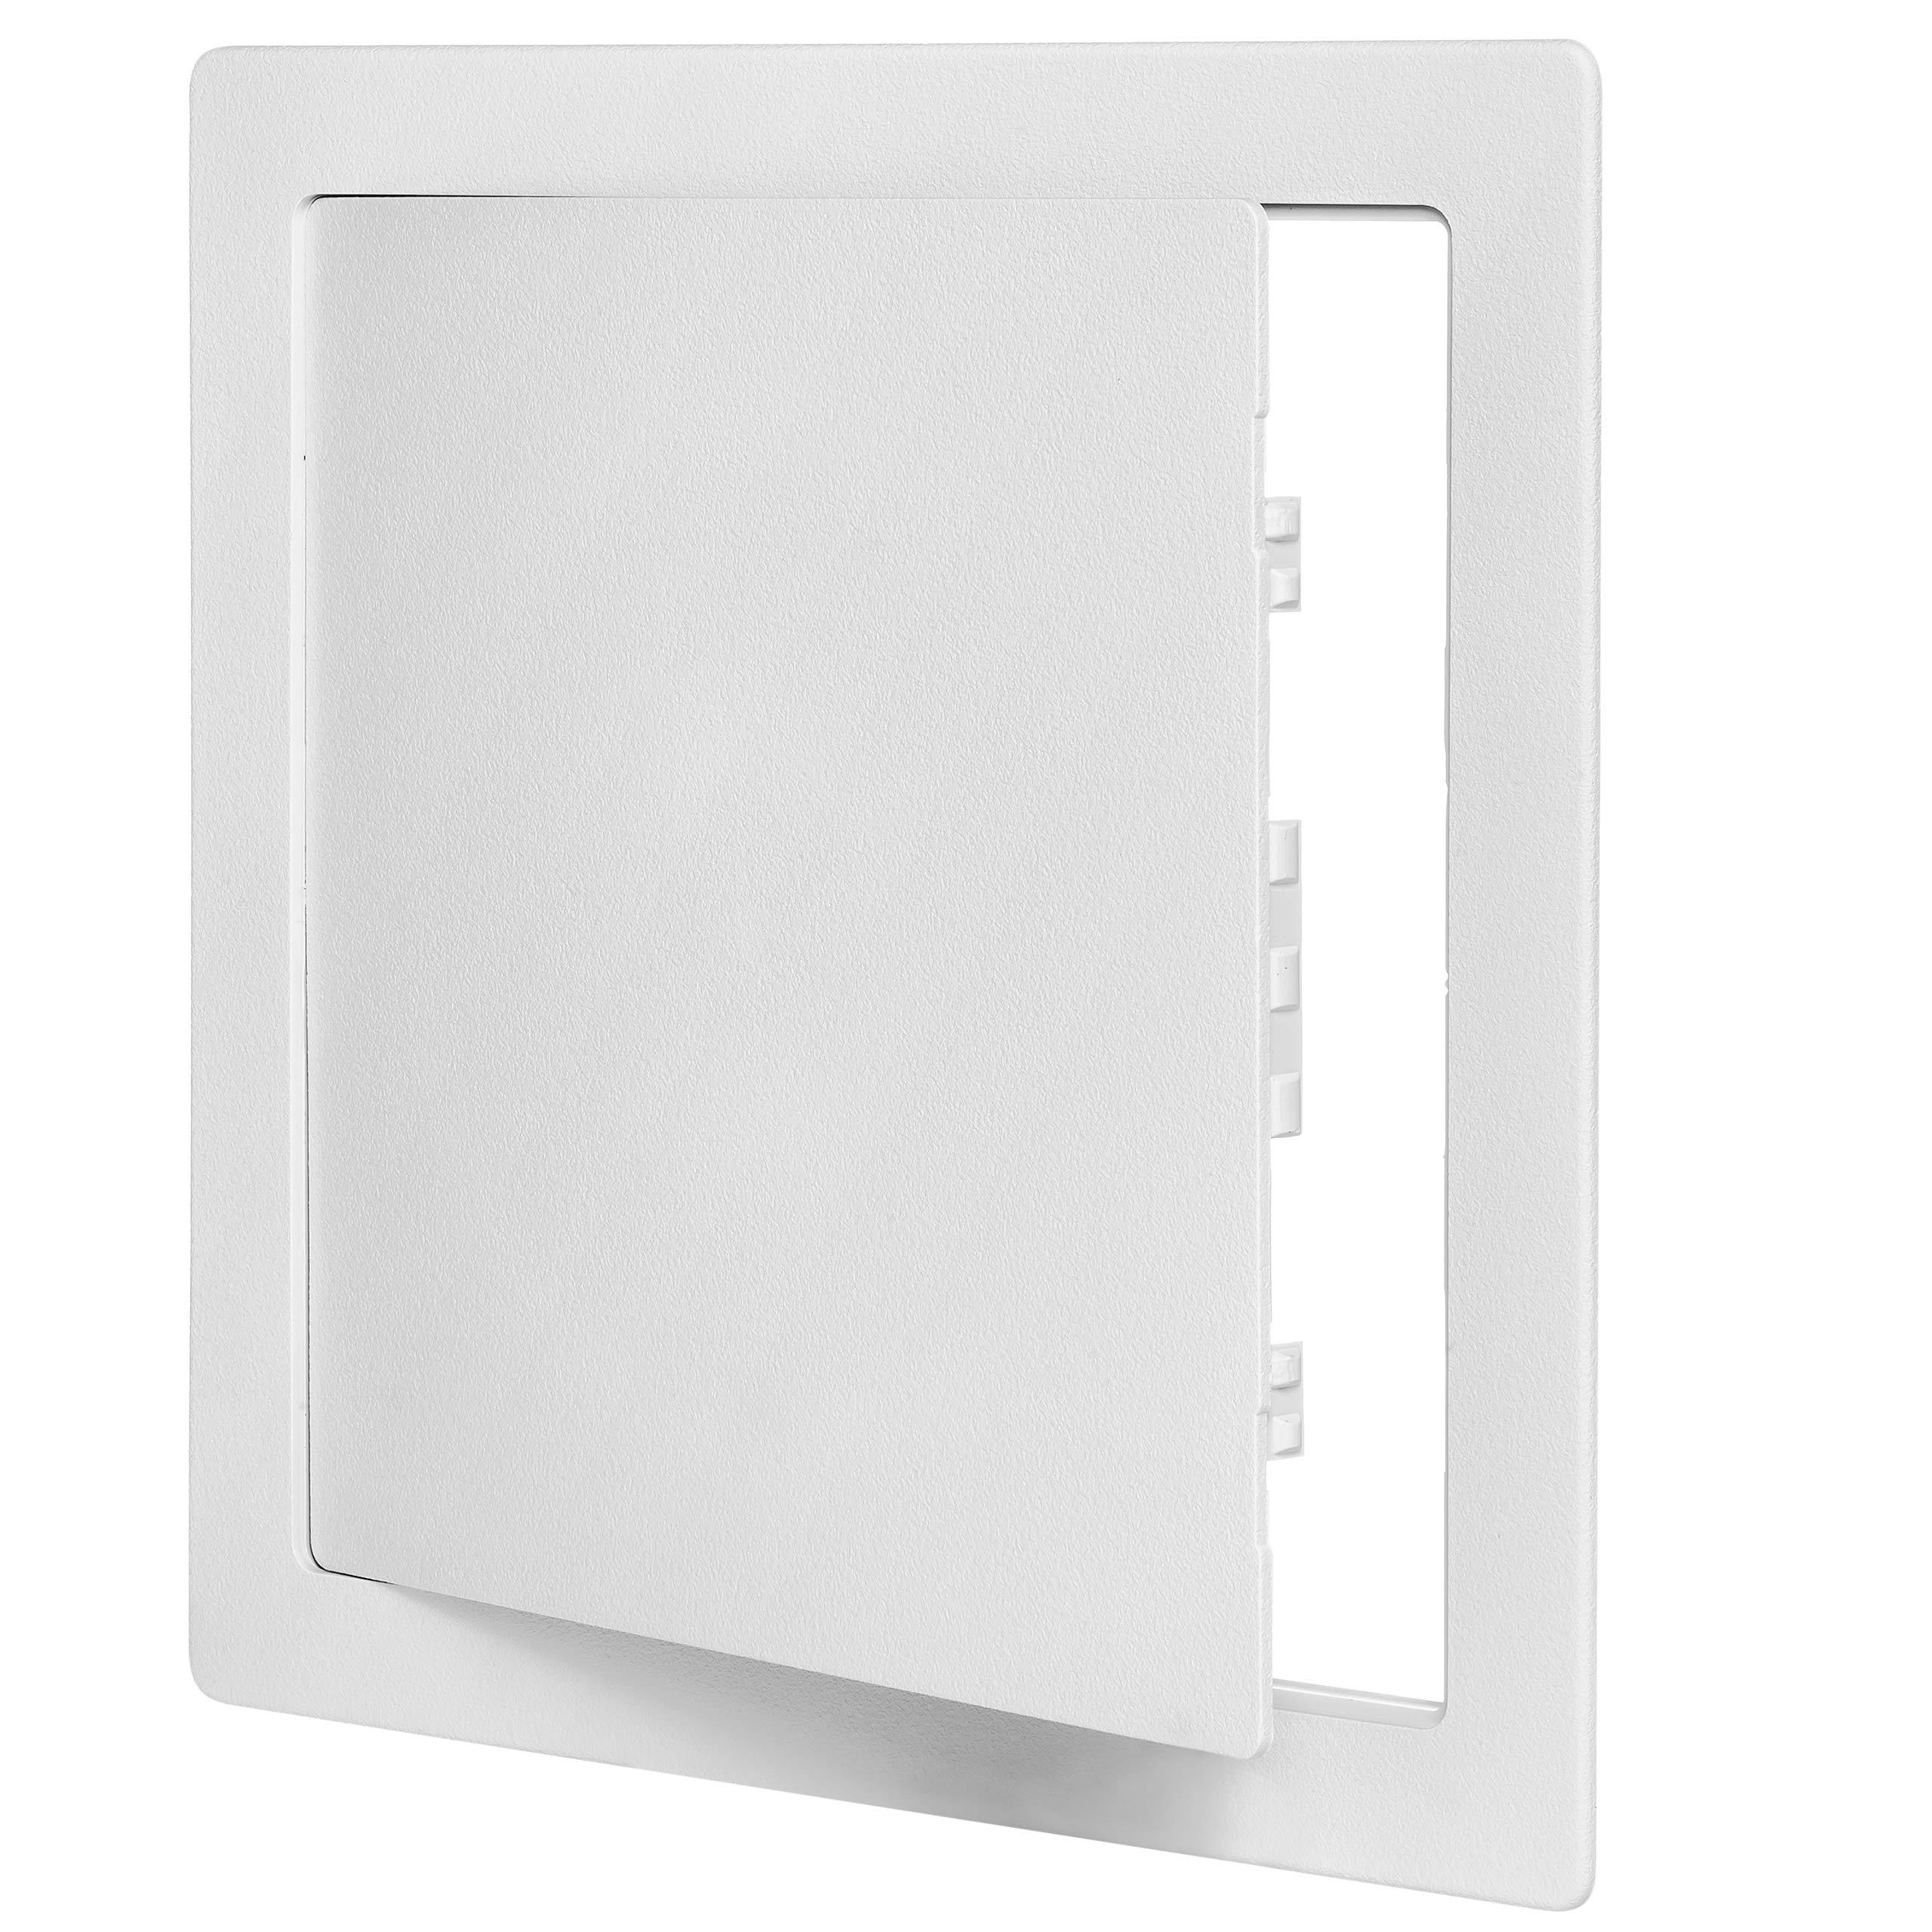 Dynasty Hardware AP1212 Access Door 12'' x 12'' Styrene Plastic White by Dynasty Hardware